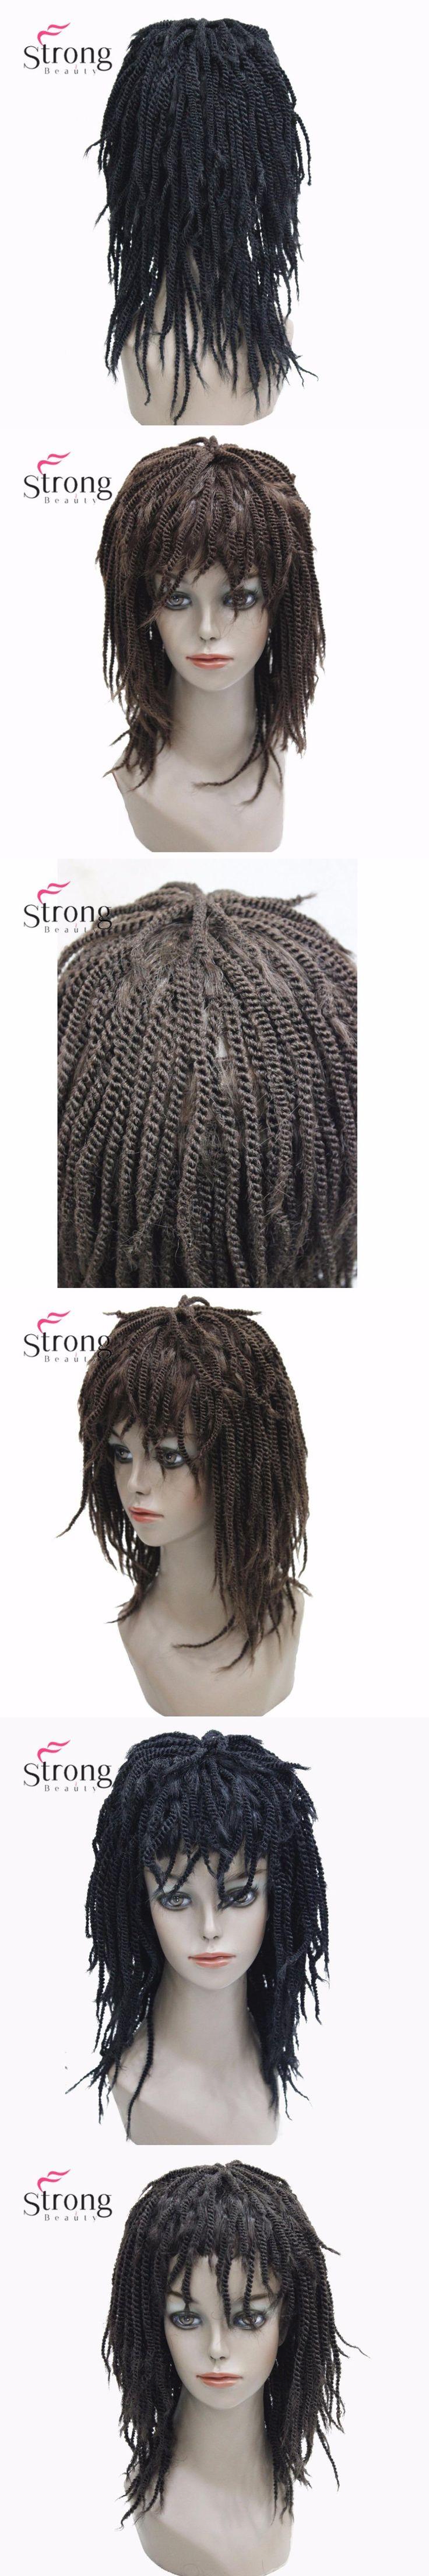 StrongBeauty Women's Synthetic Braided Box Braids Wig Medium length Dark Black/Brown Dreadlock Hair African American Wigs